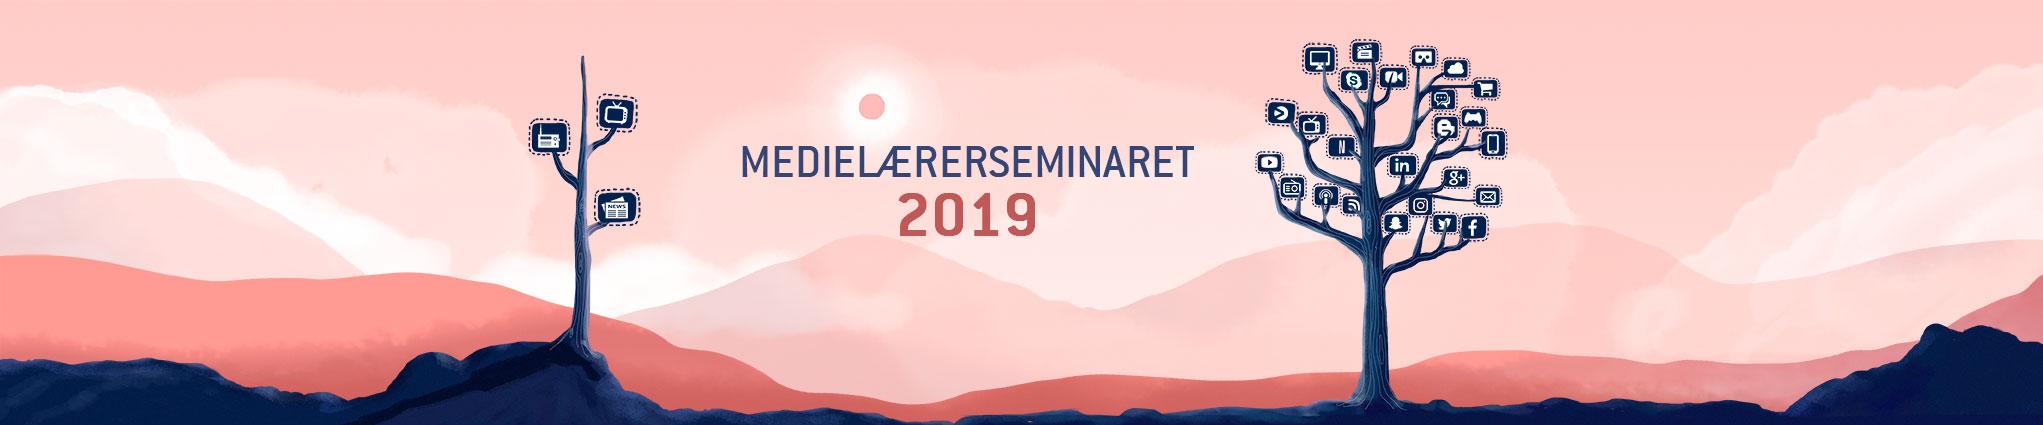 Medielærerseminaret 2019 og NMD19